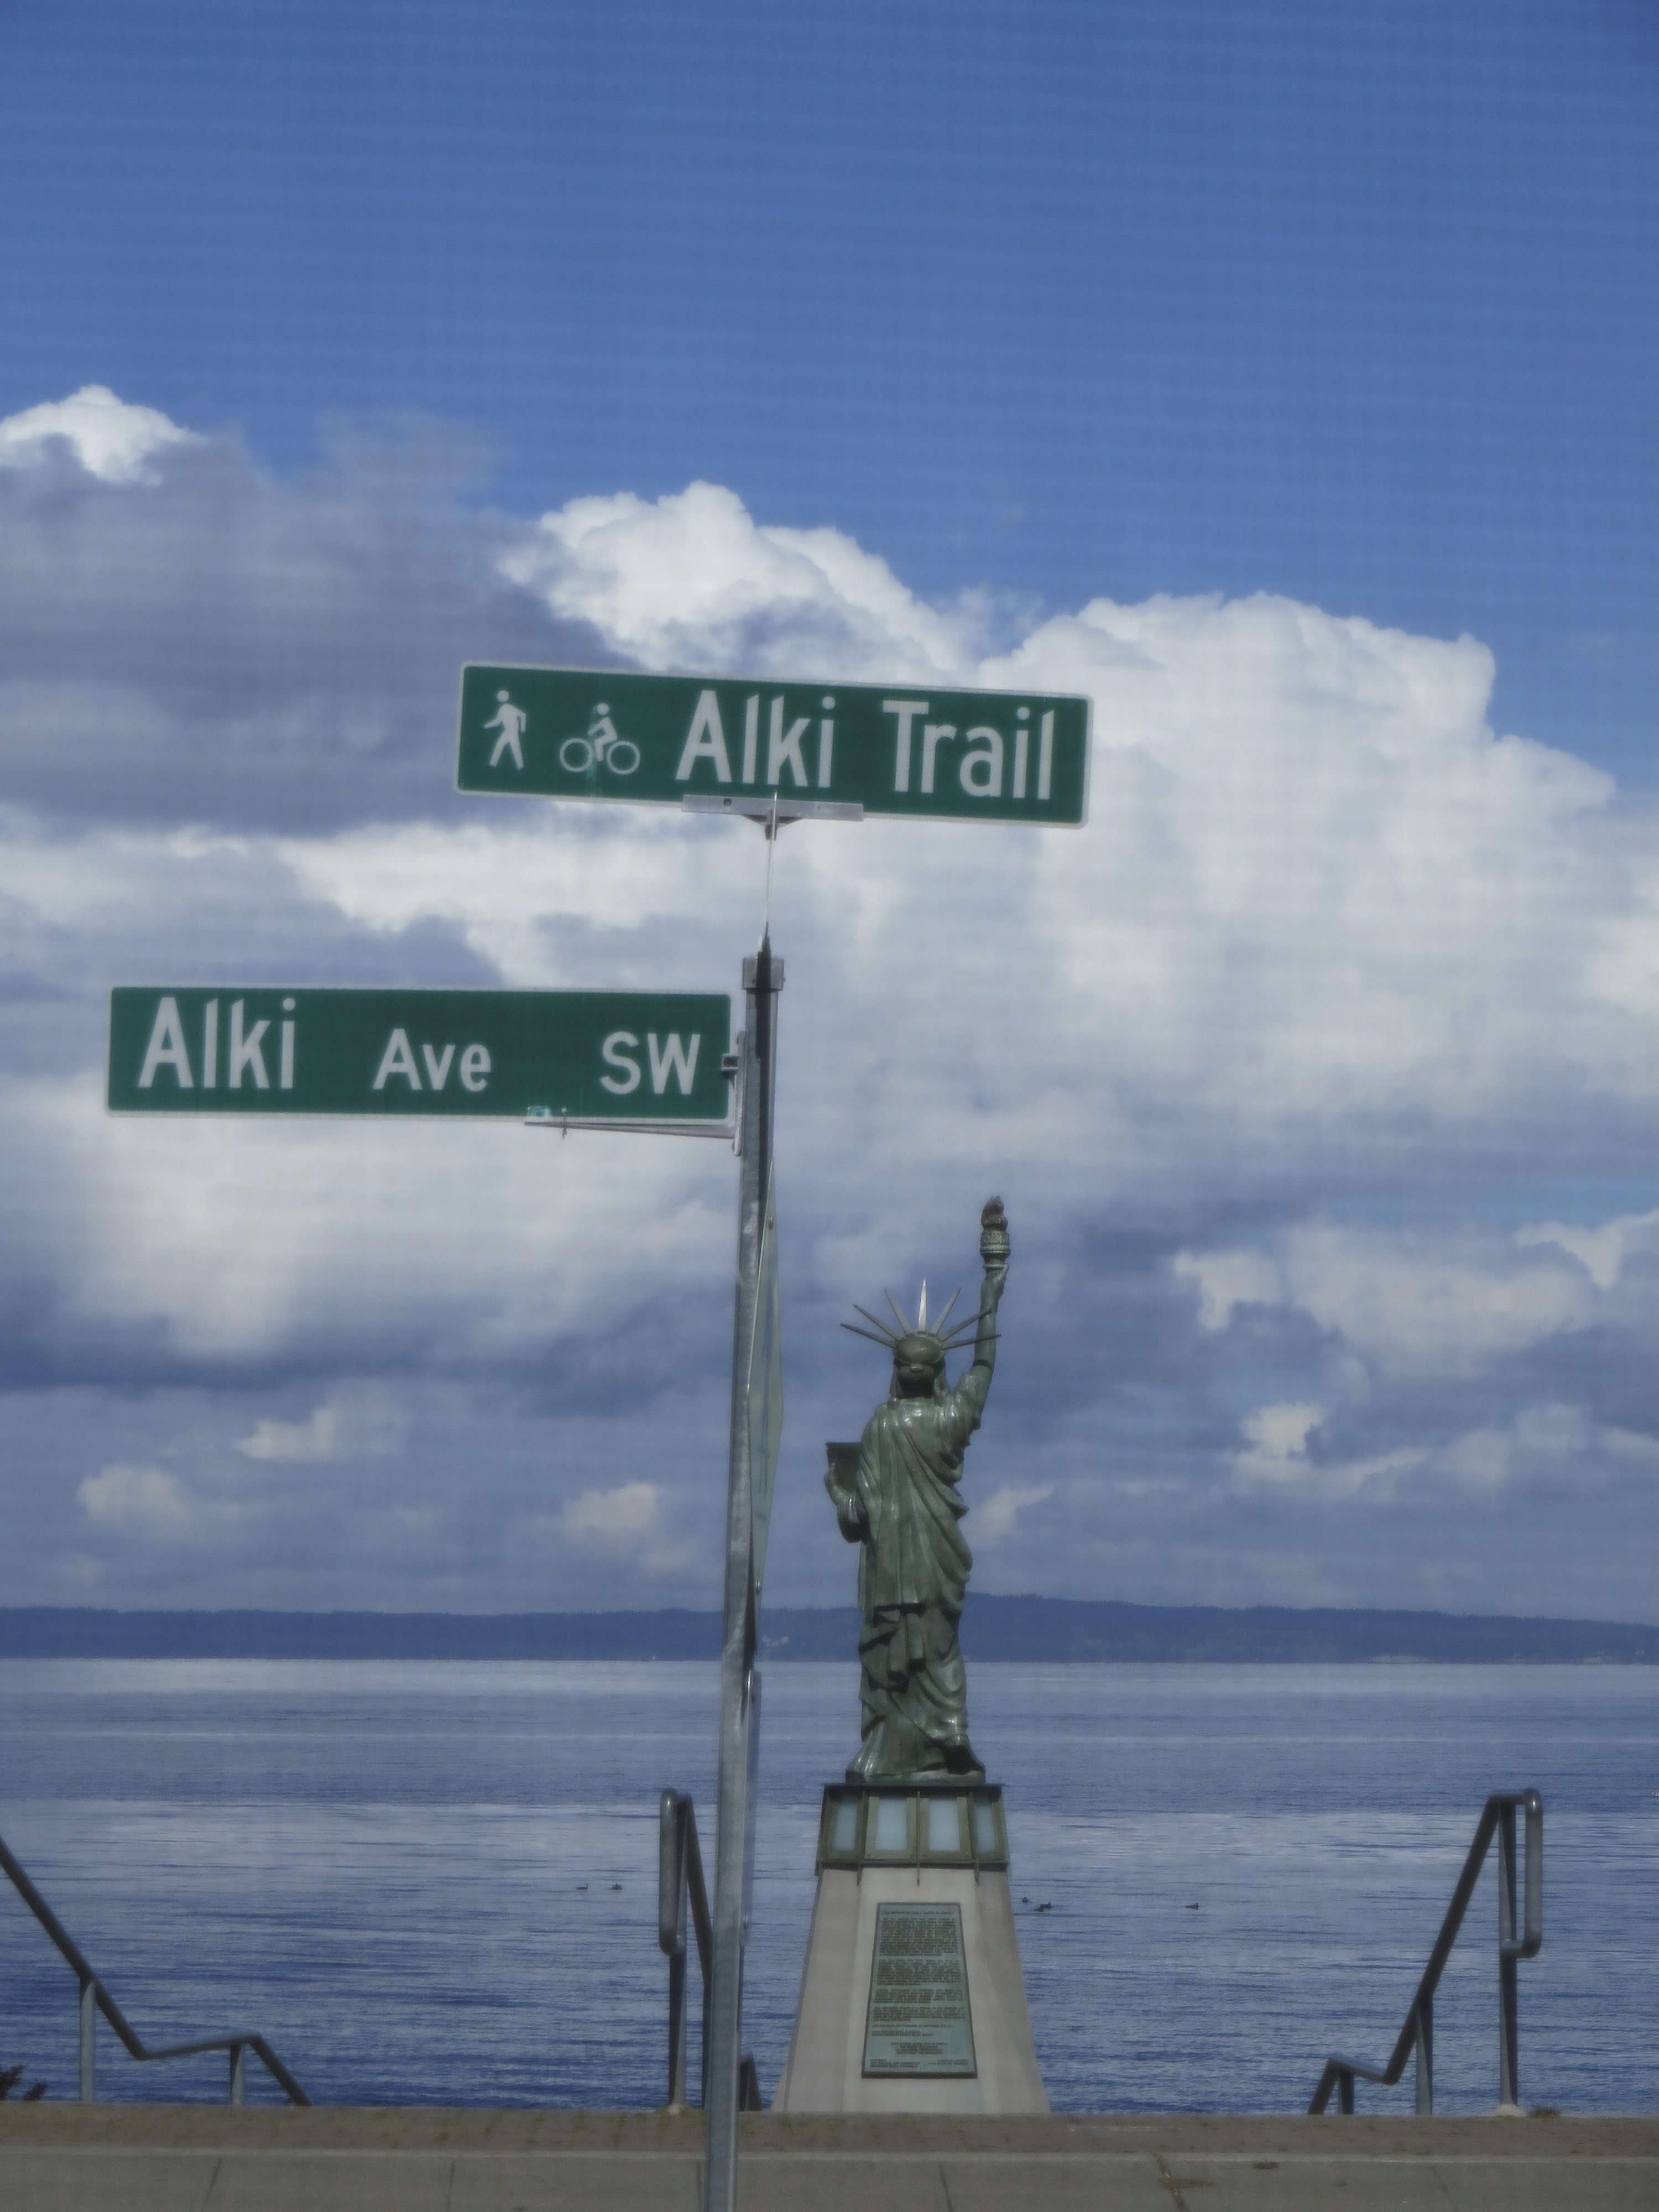 Alki Point, West Seattle. A beloved escape.